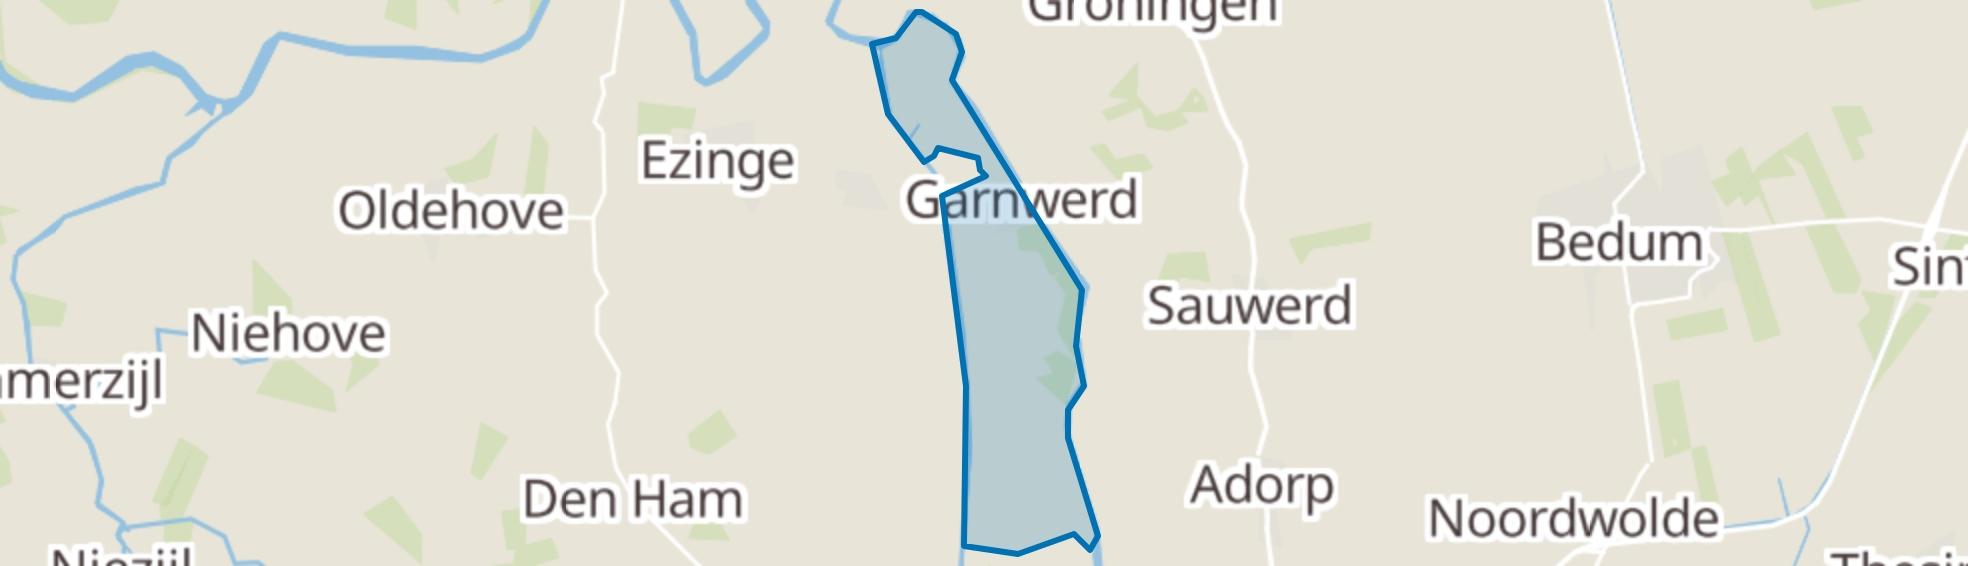 Garnwerd map